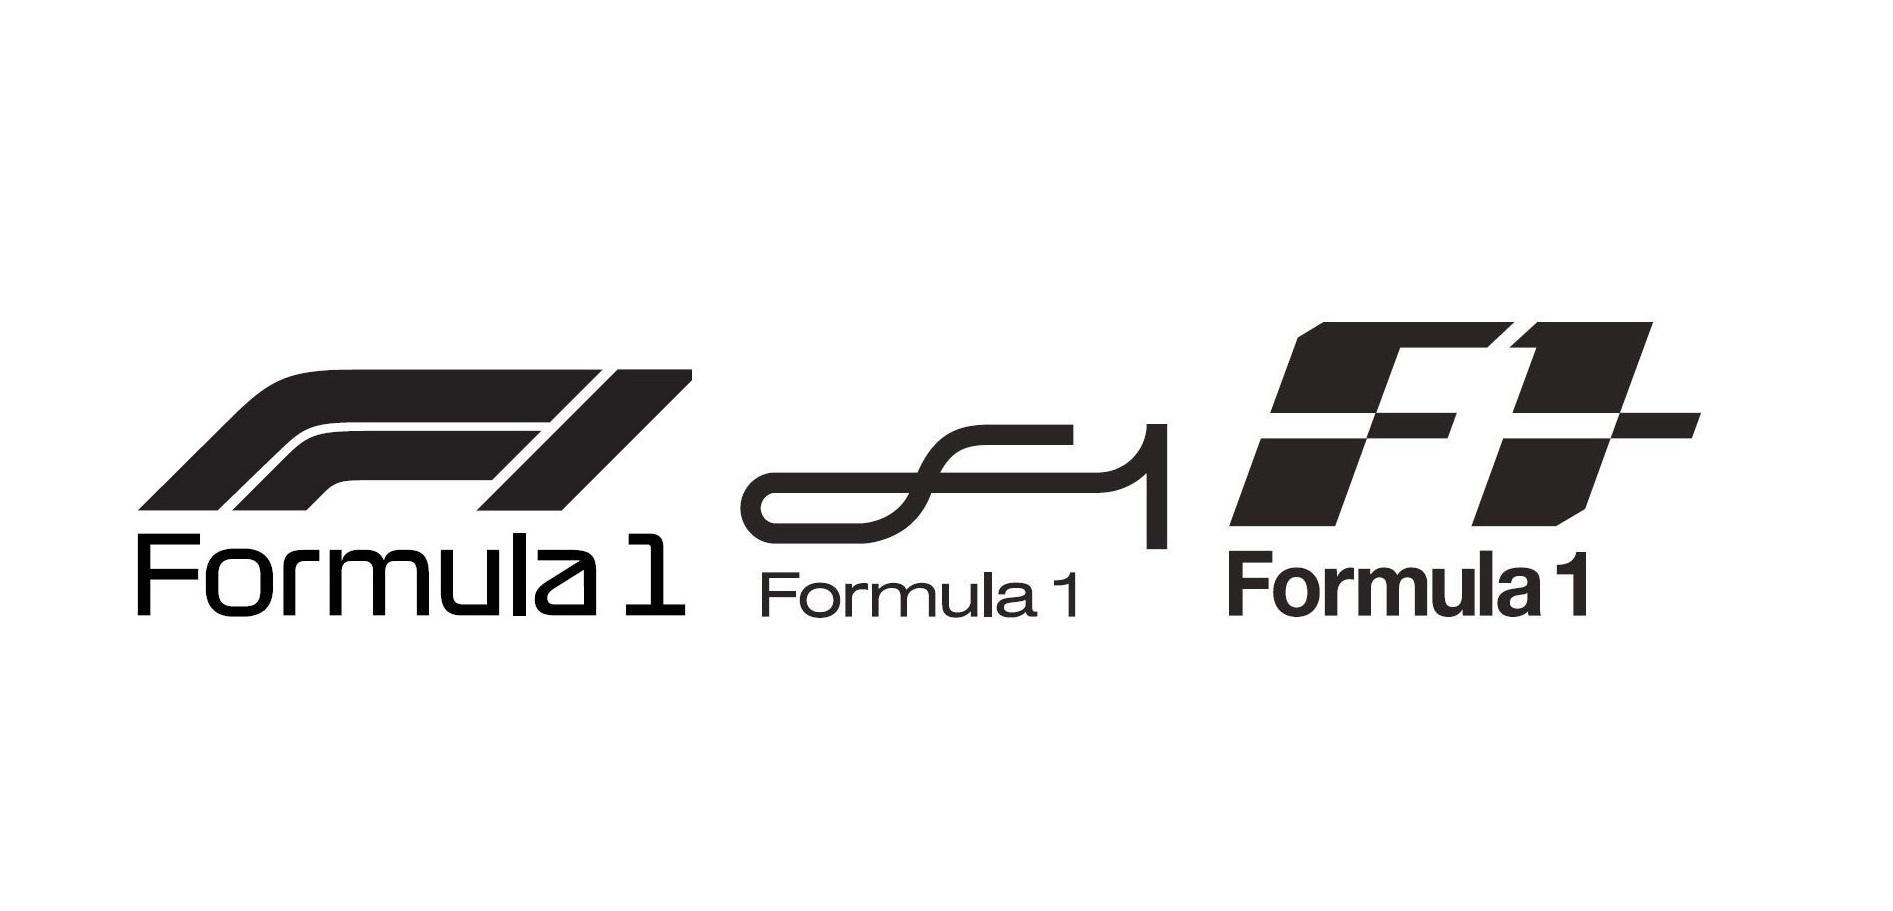 New Trademark Filings Hint at New F1 Logo Design ...